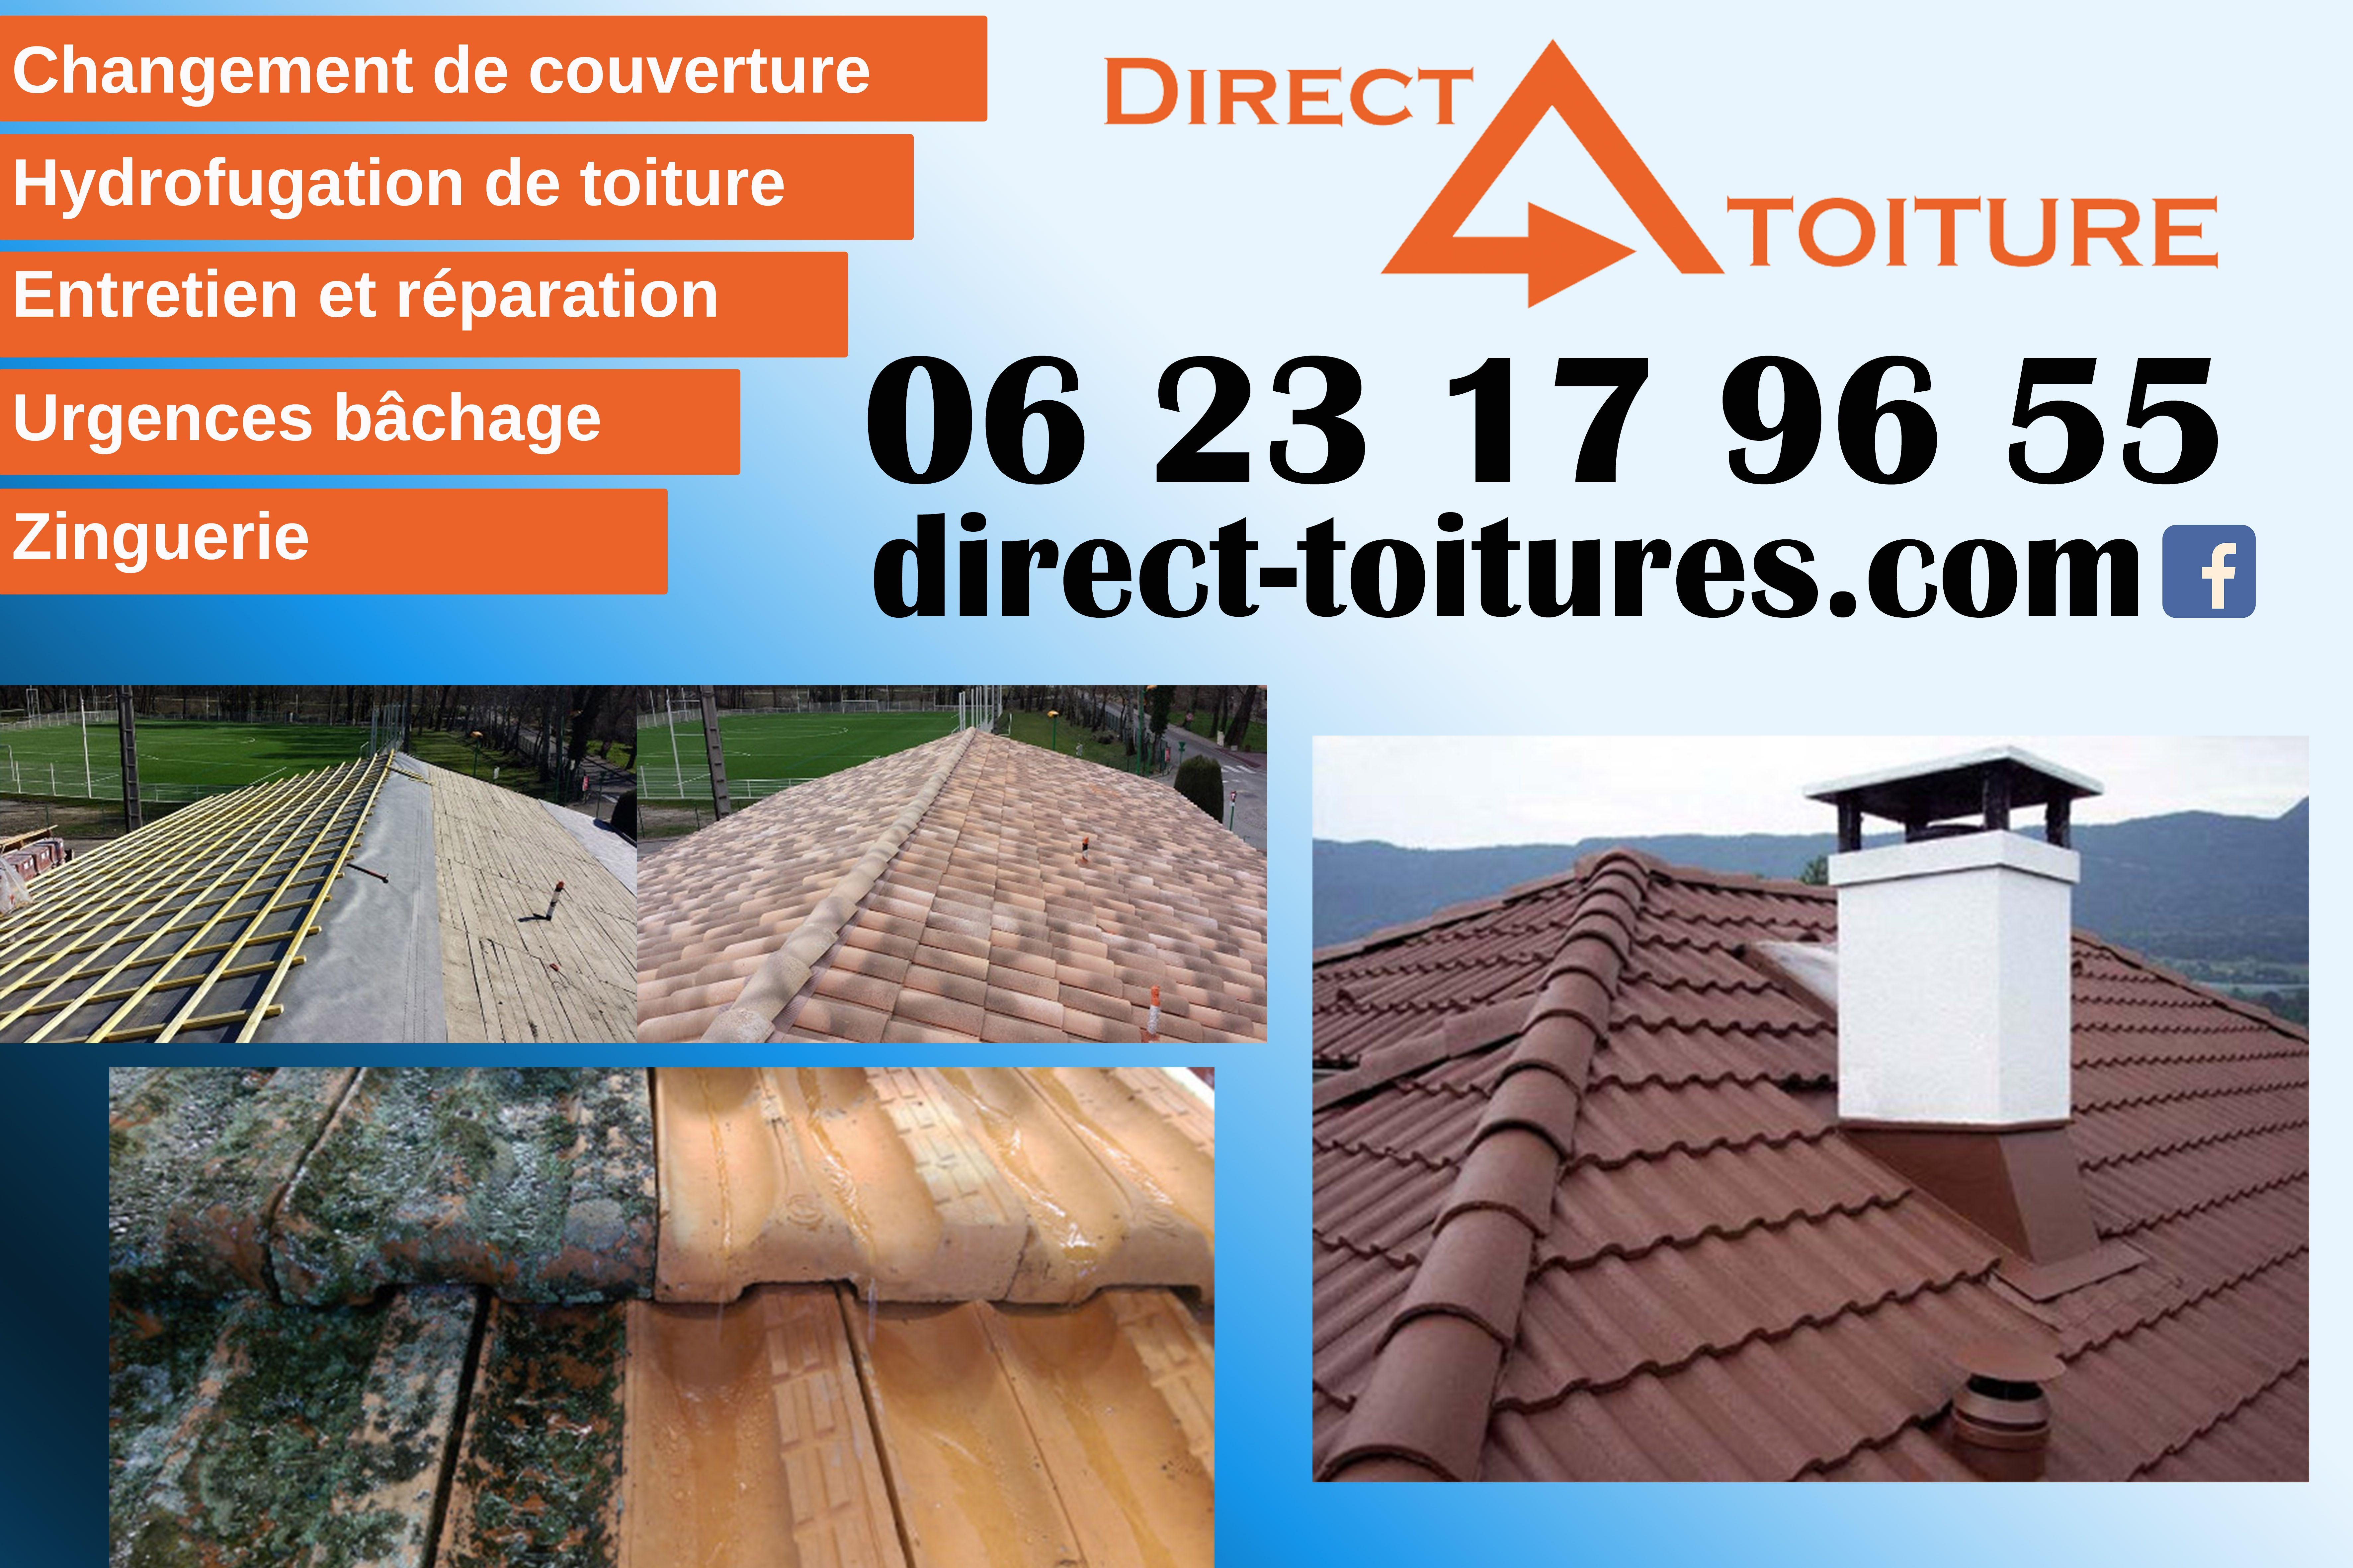 Direct Toiture Toiture Reparation Toiture Ecran Sous Toiture